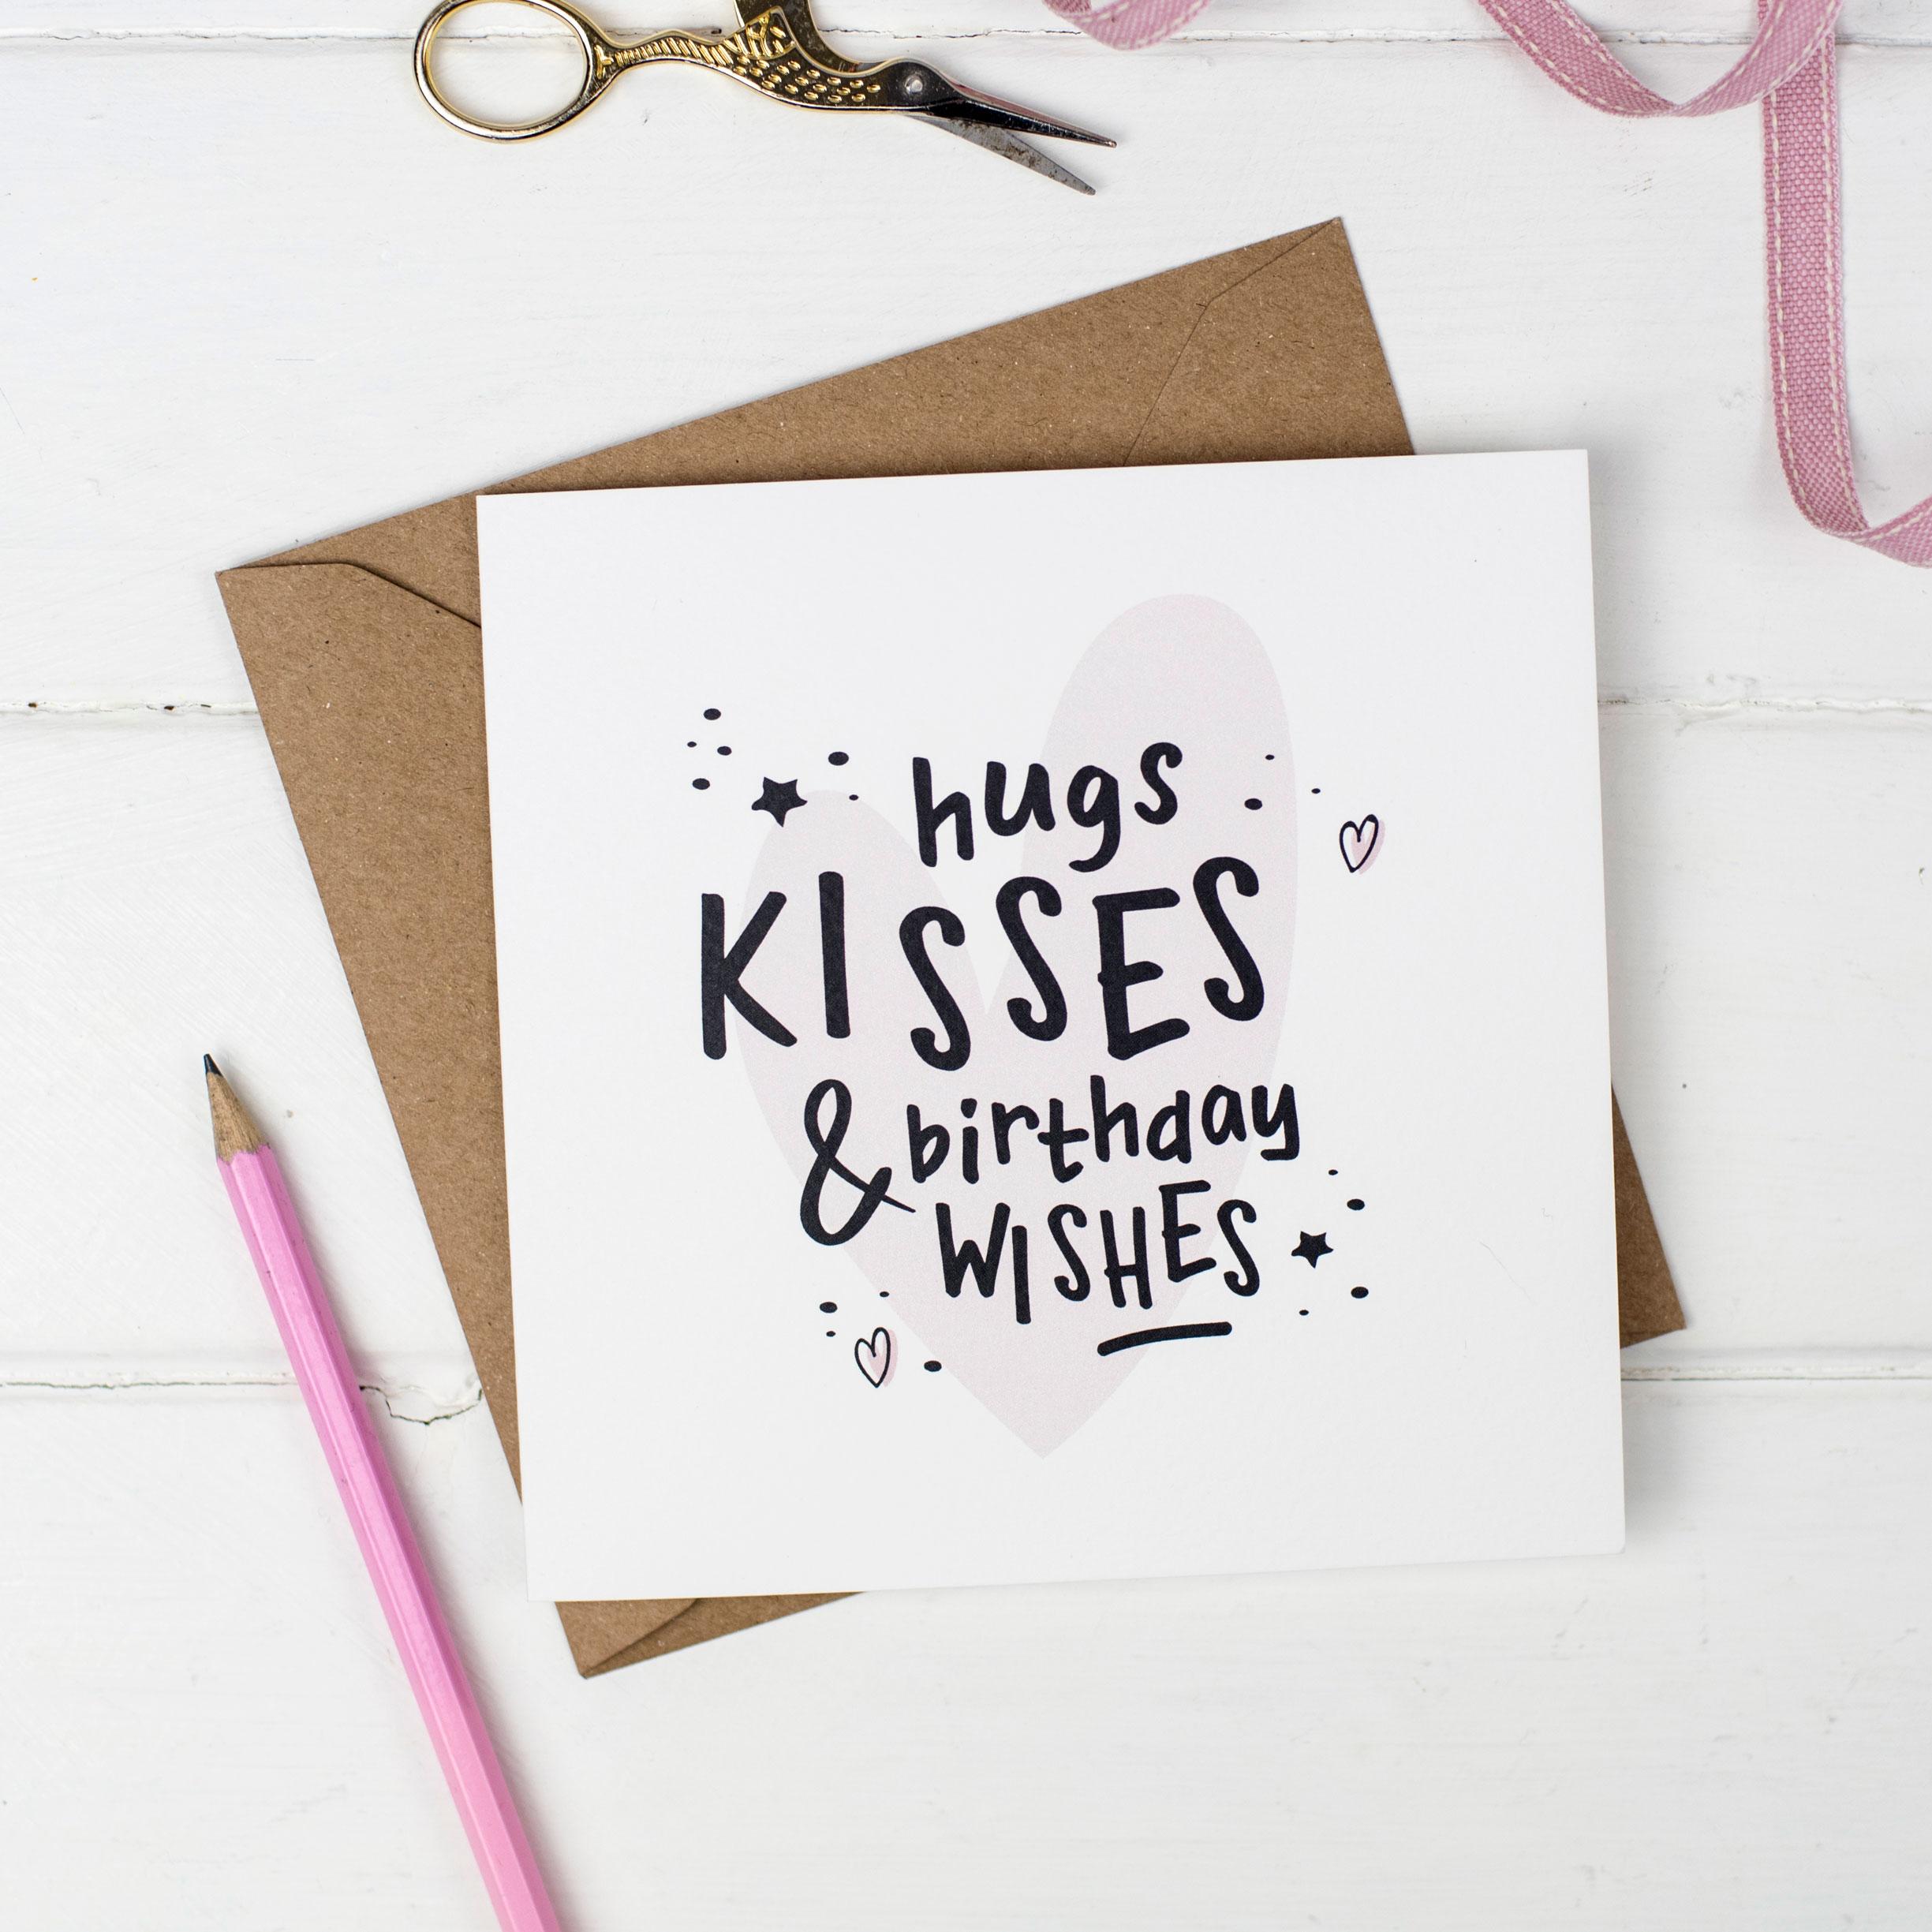 Hugs Kisses Birthday Wishes Card